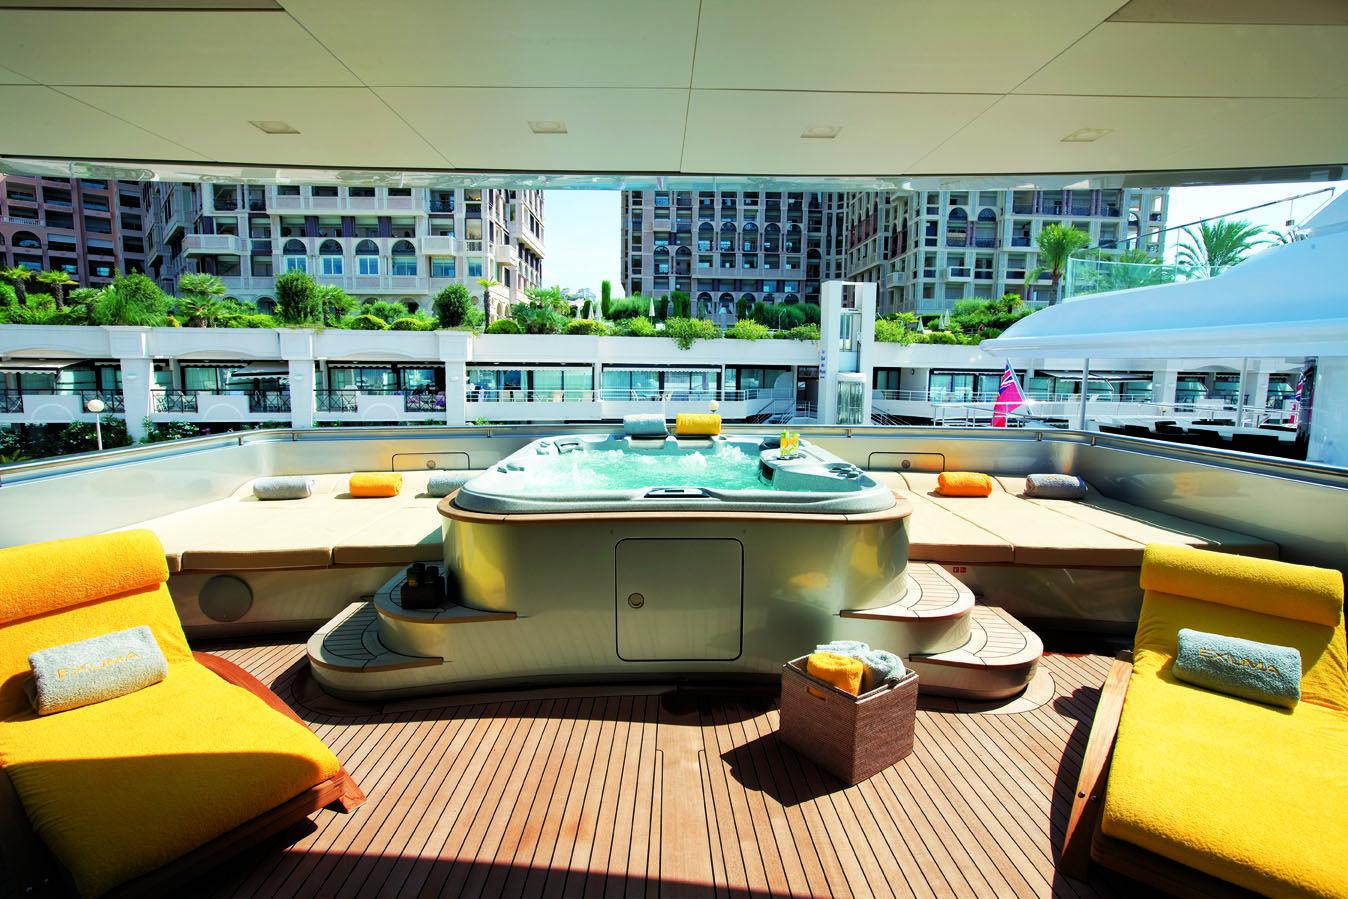 MY Exuma, 50m  #exploreryacht #explorer #adventure #luxury #luxurydesign #monacoyachtshow #superyacht #superyachtdesign #interiordesign #motoryacht